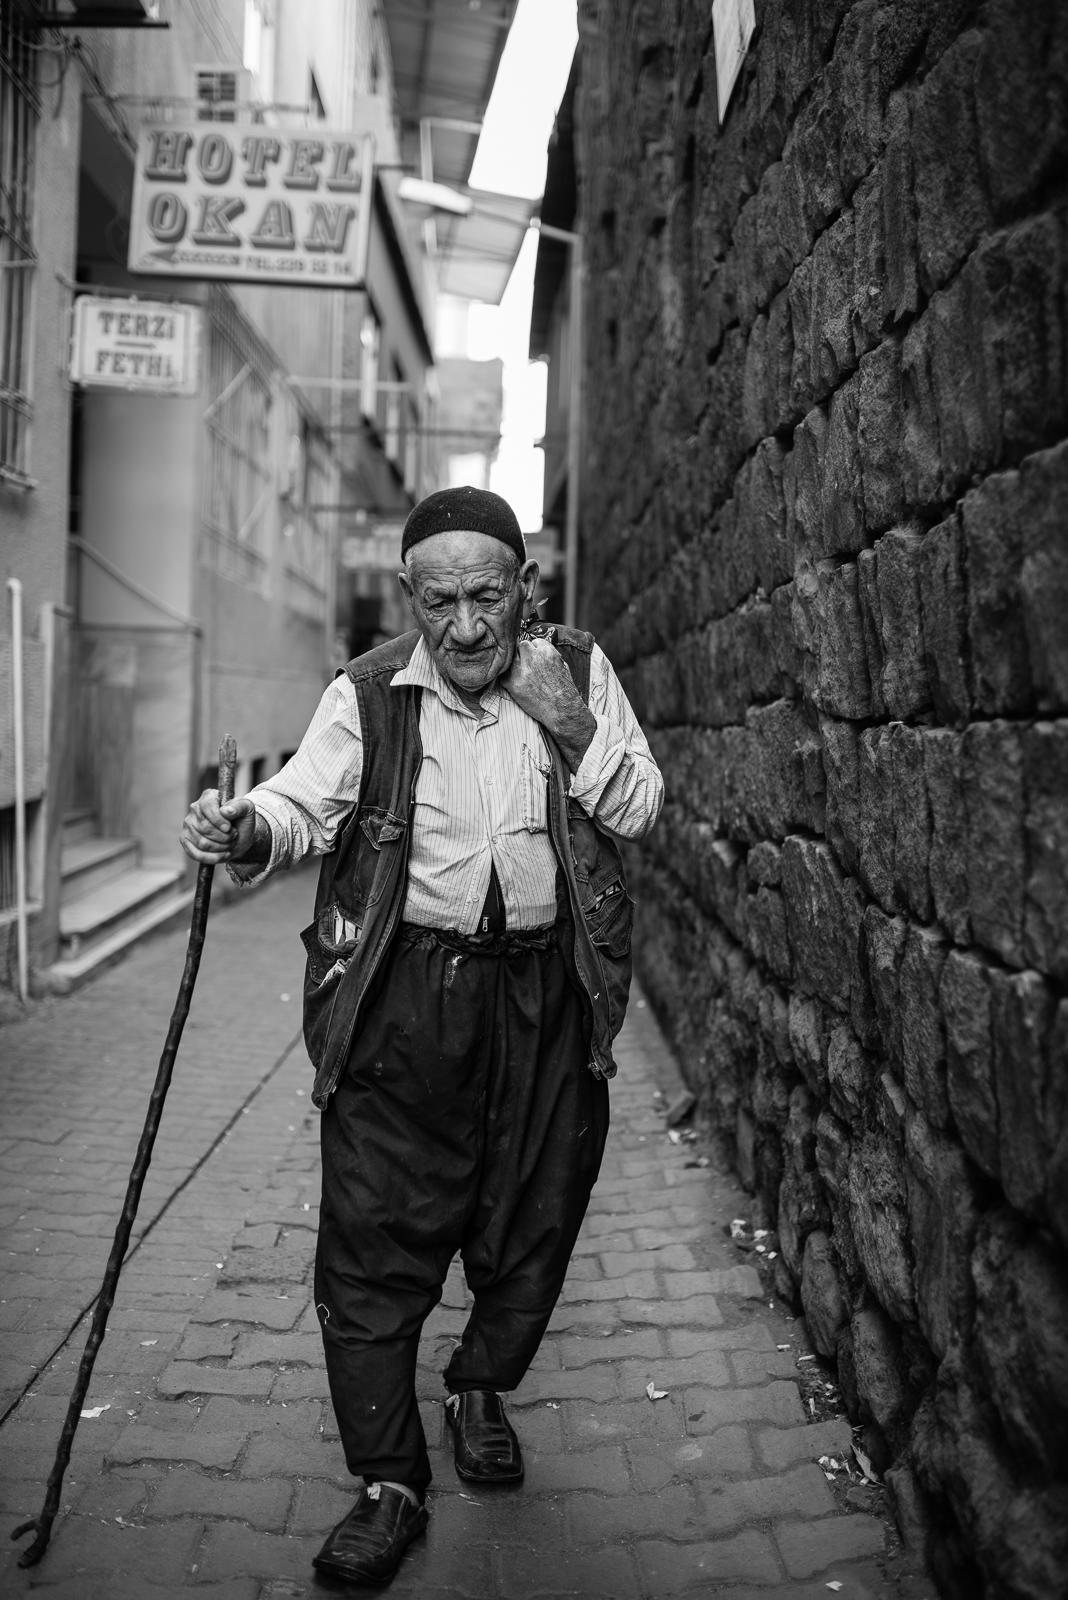 Street scene from Diyarbakir (Turkey)